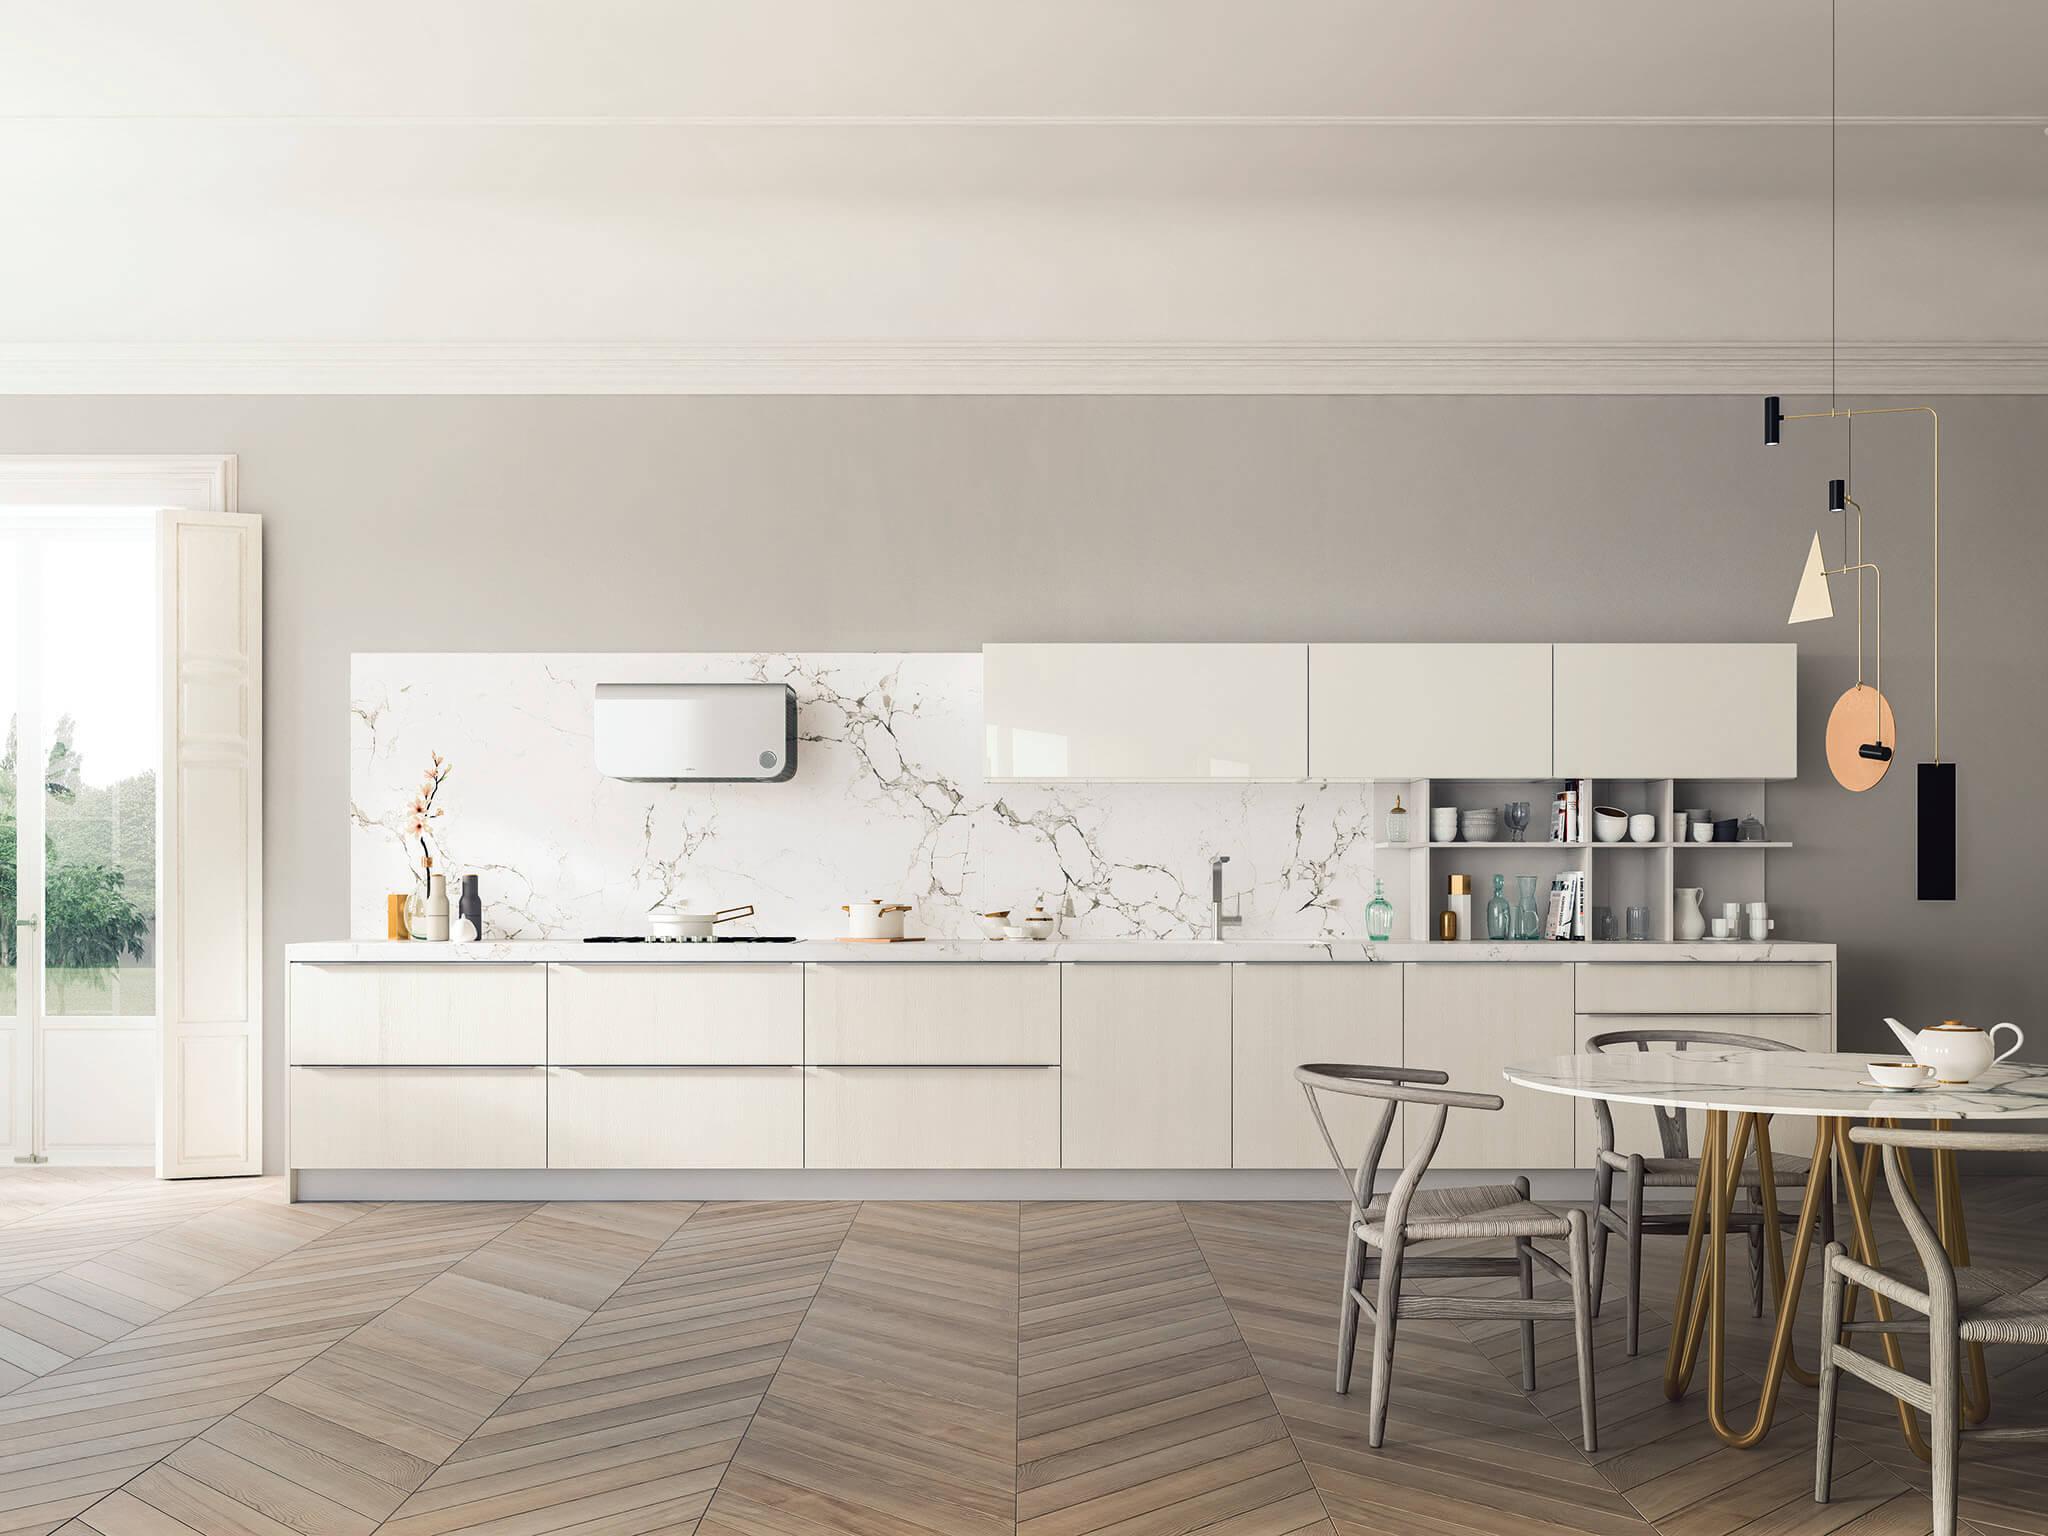 alexia kitchen cabinetry archisesto chicago